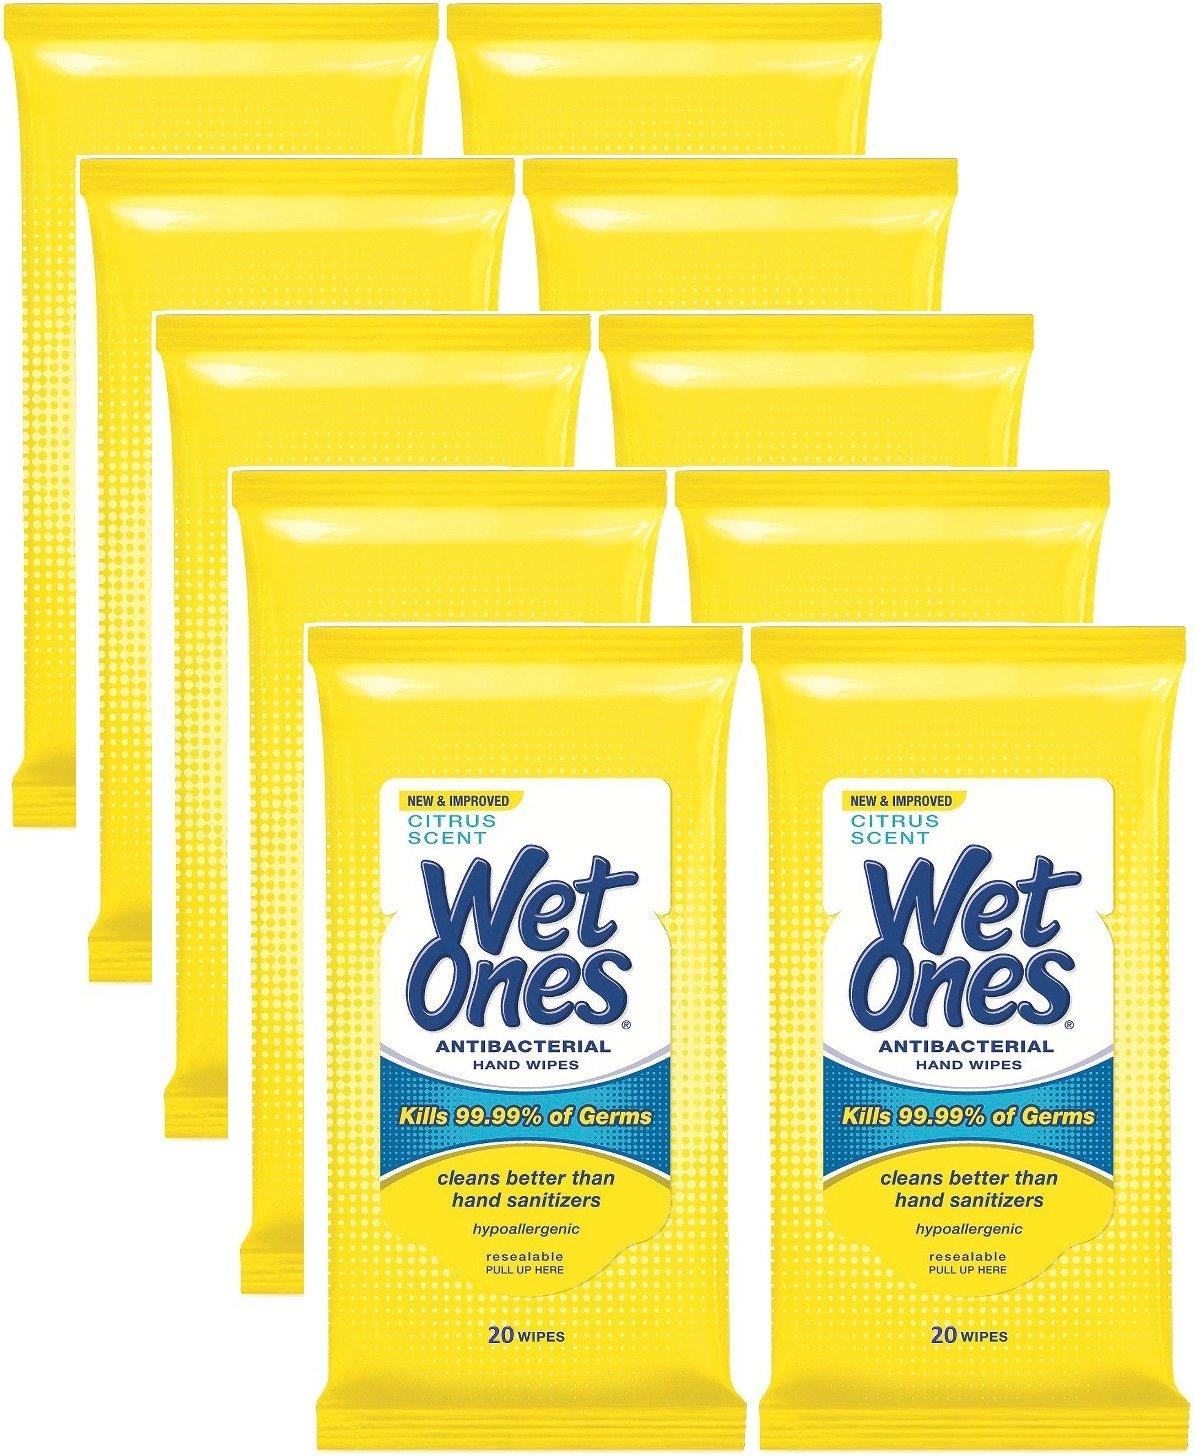 Wet Ones Antibacterial Hands & Face Wipes, Citrus Scent, 20 Count Travel Pack (Pack of 10) 200 WipesTotal